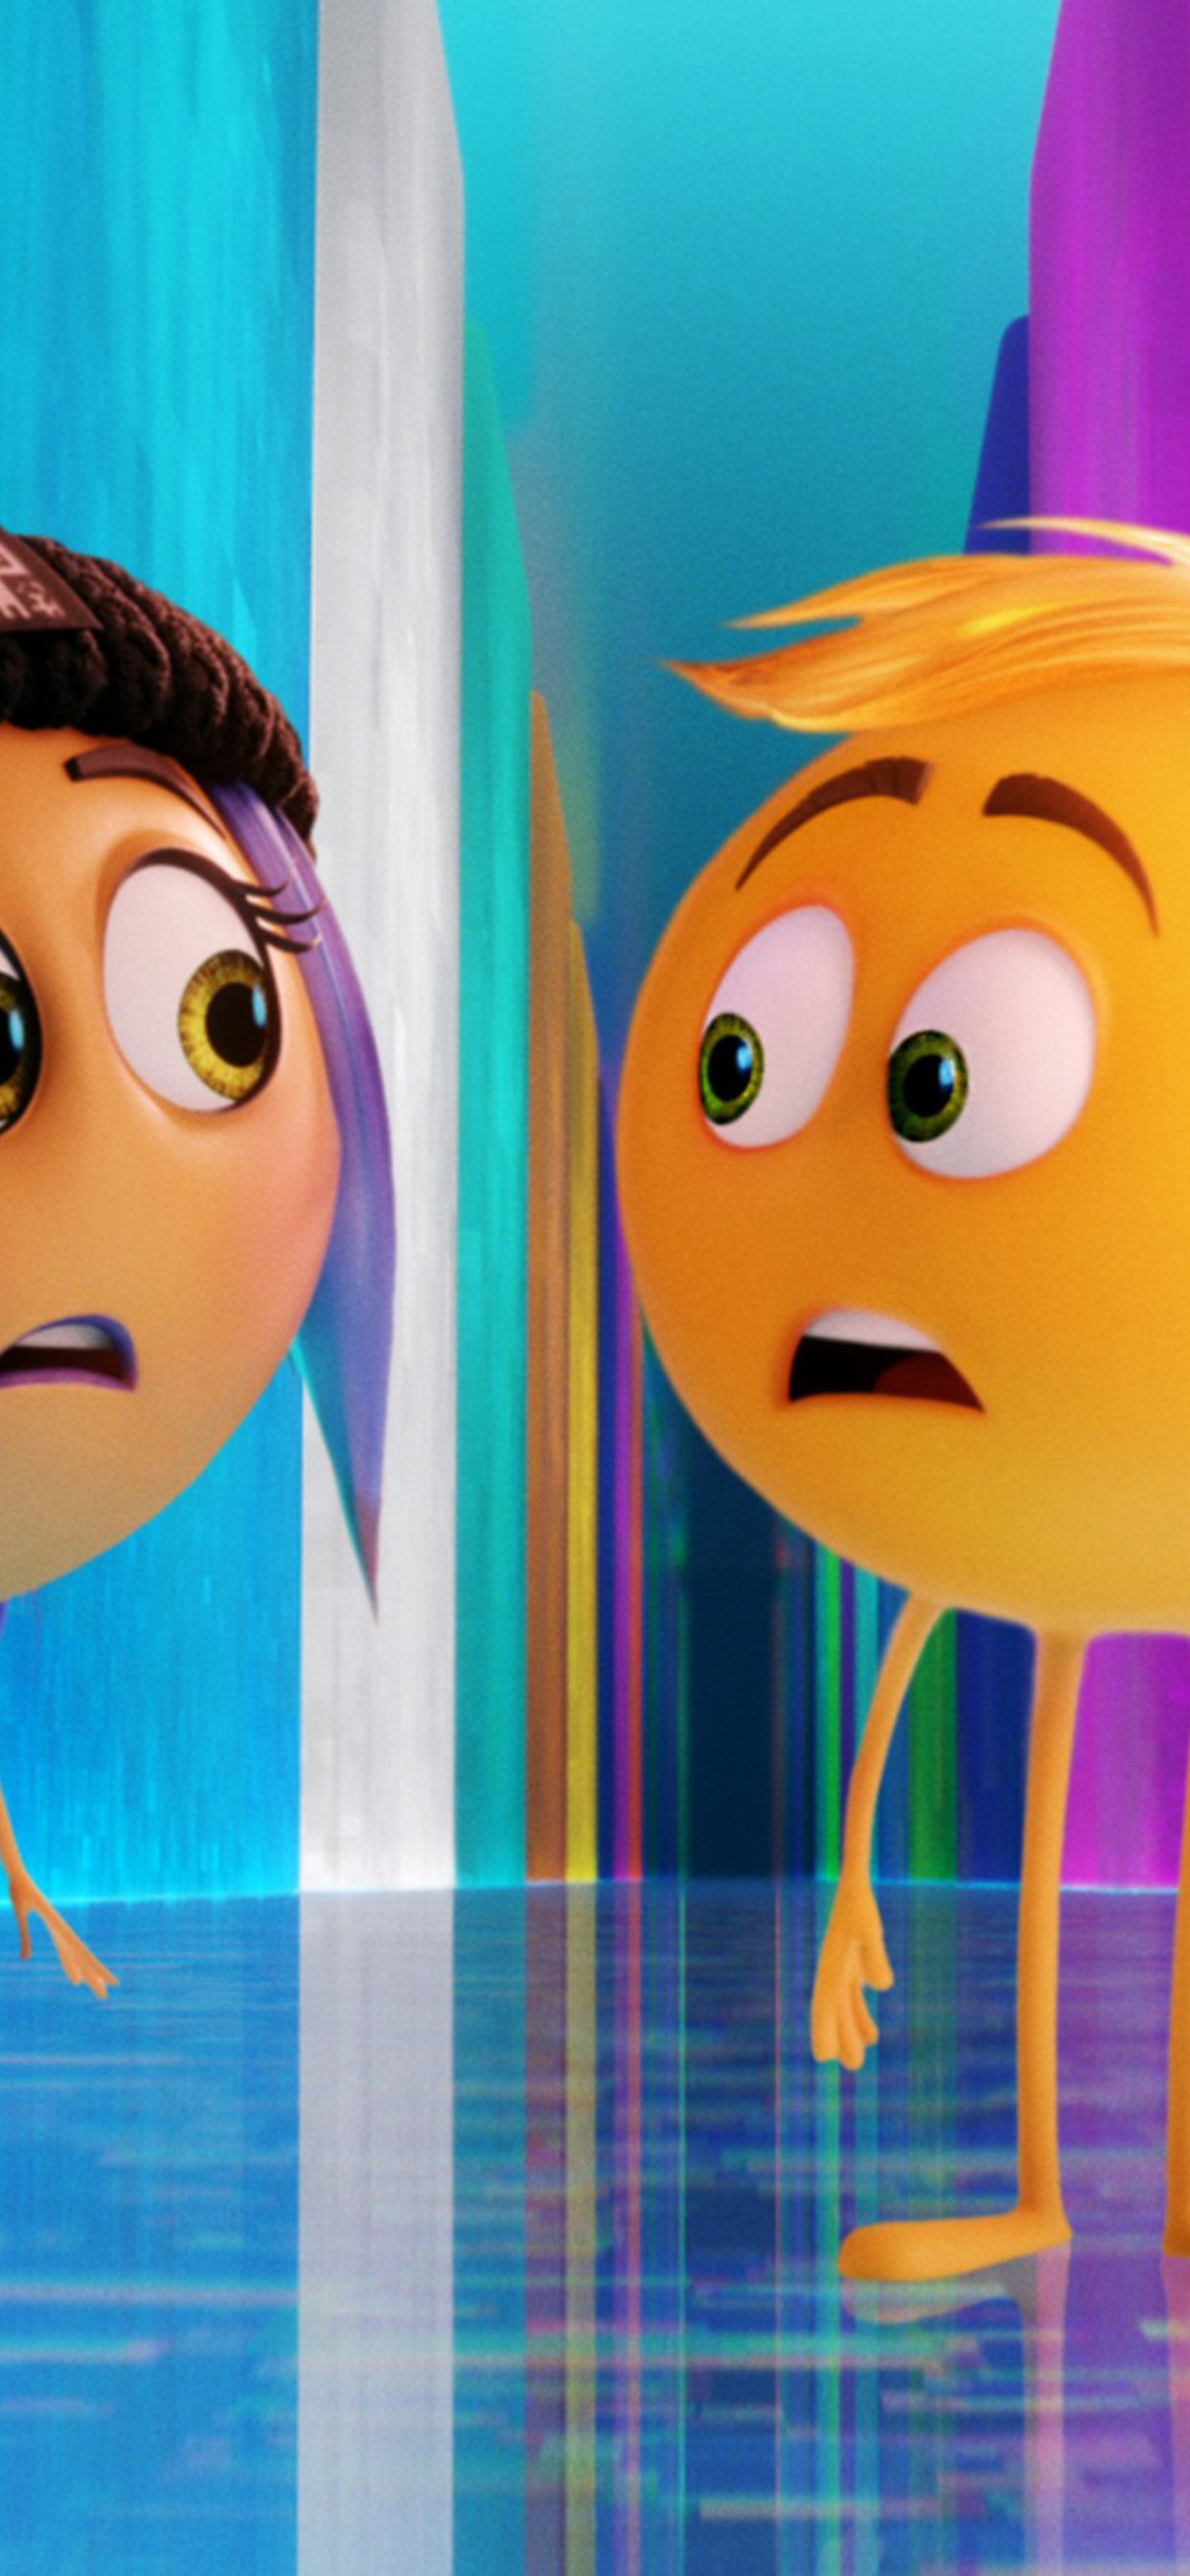 the-emoji-movie-be.jpg